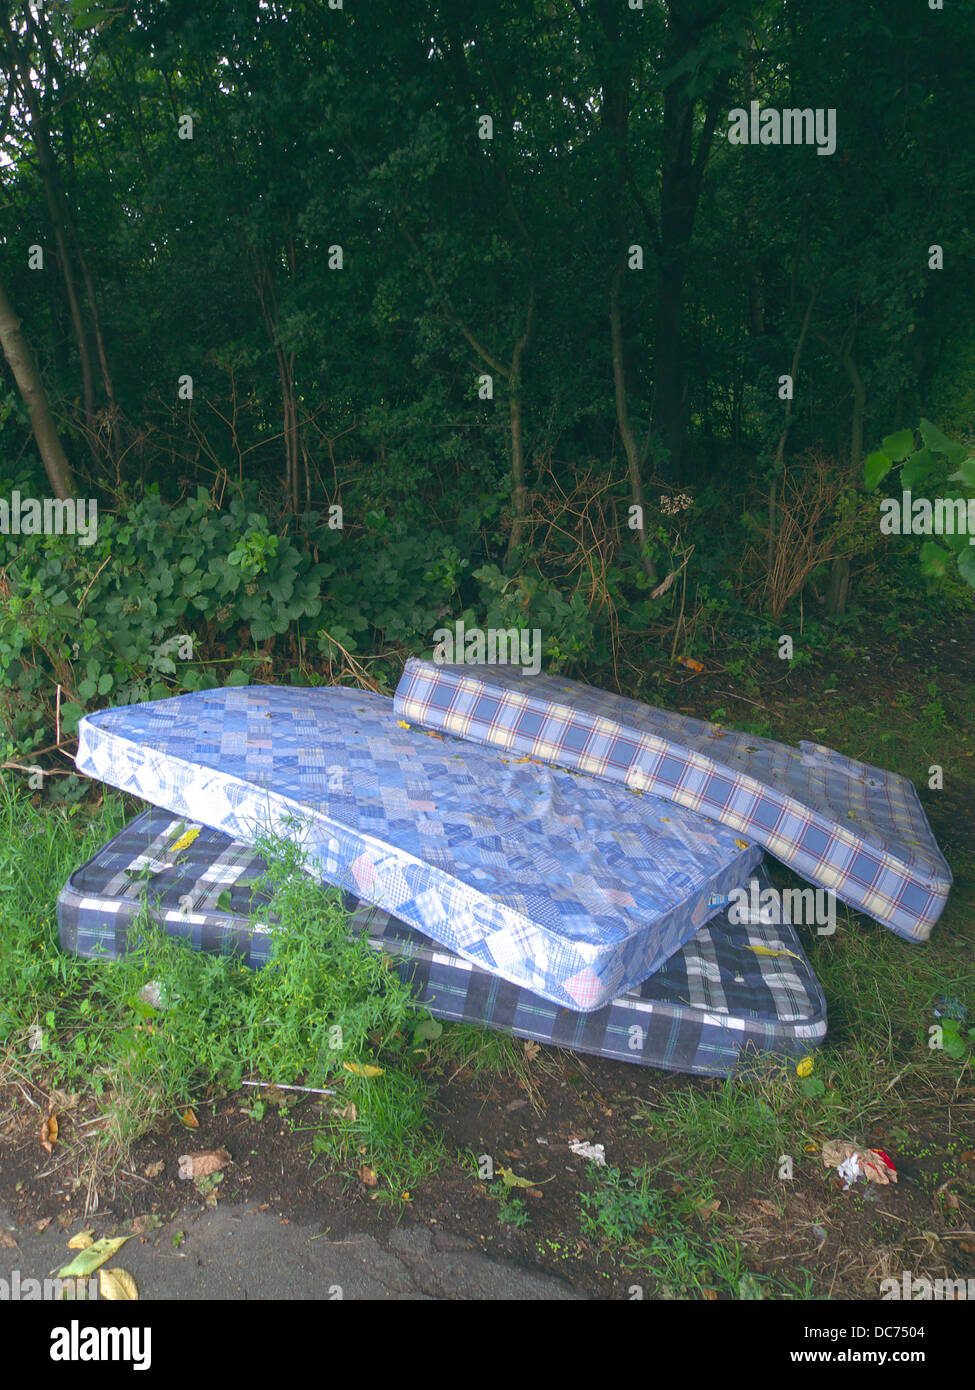 Pile of Dumped Mattresses, UK - Stock Image